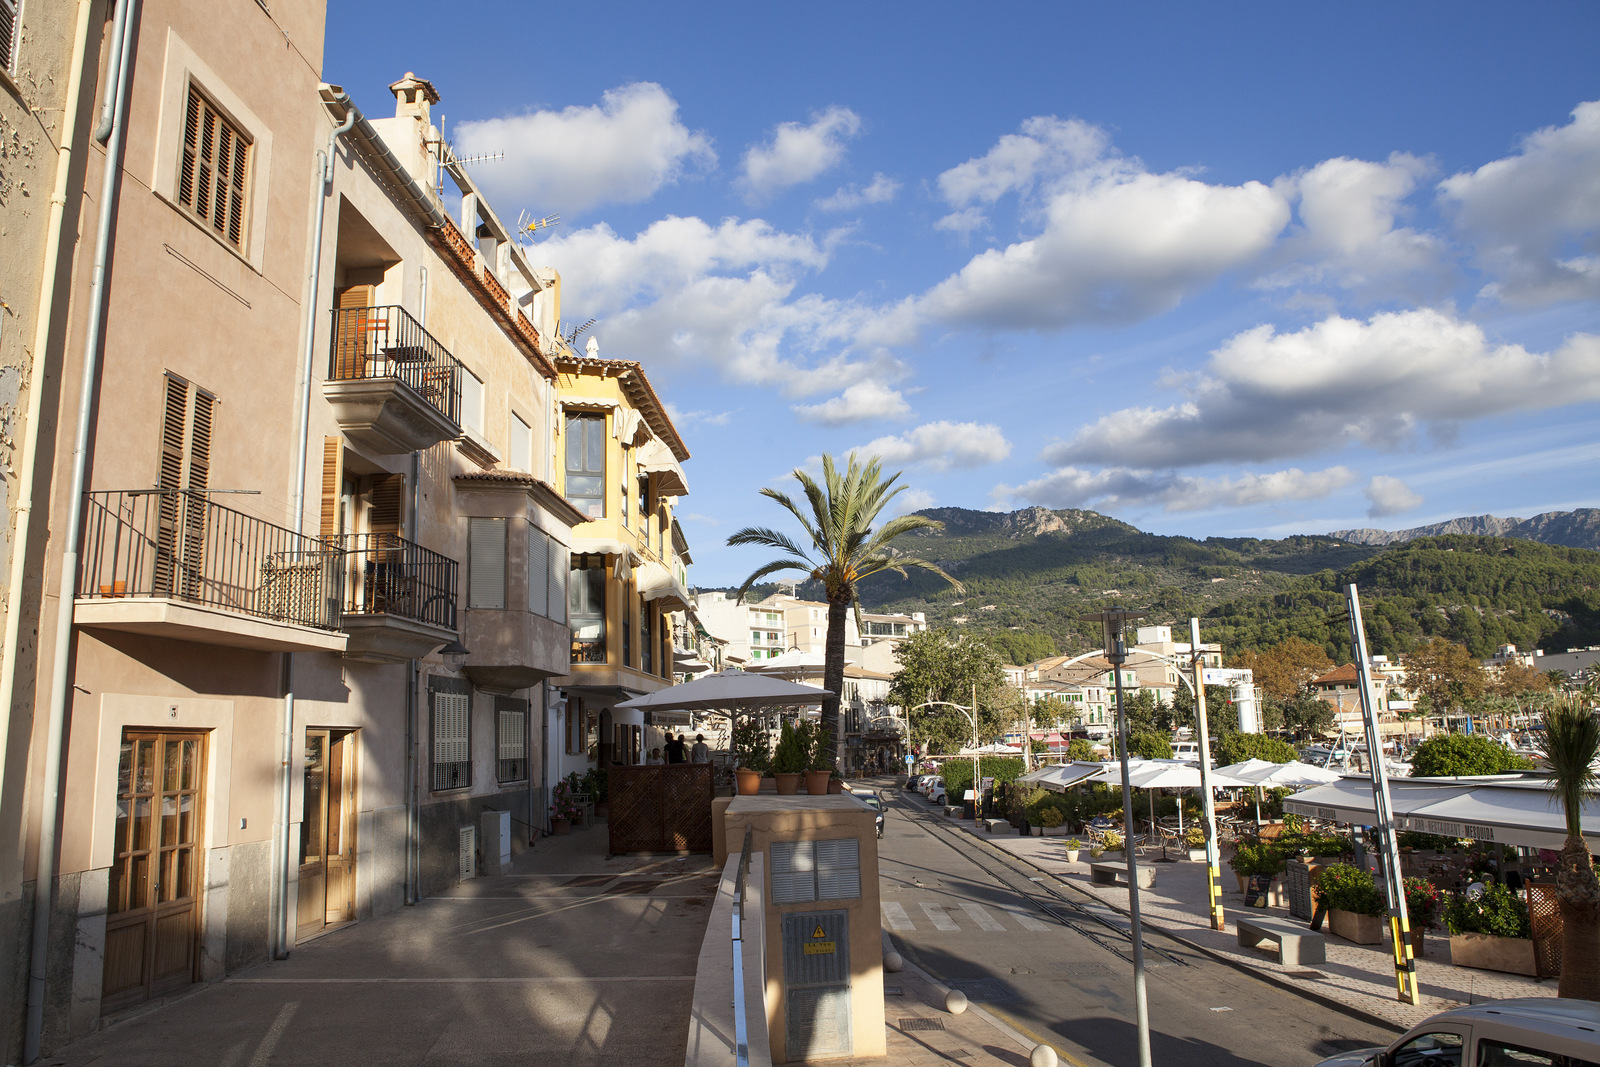 Copy of Casita Sal de Mar, Port de Sóller, Mallorca